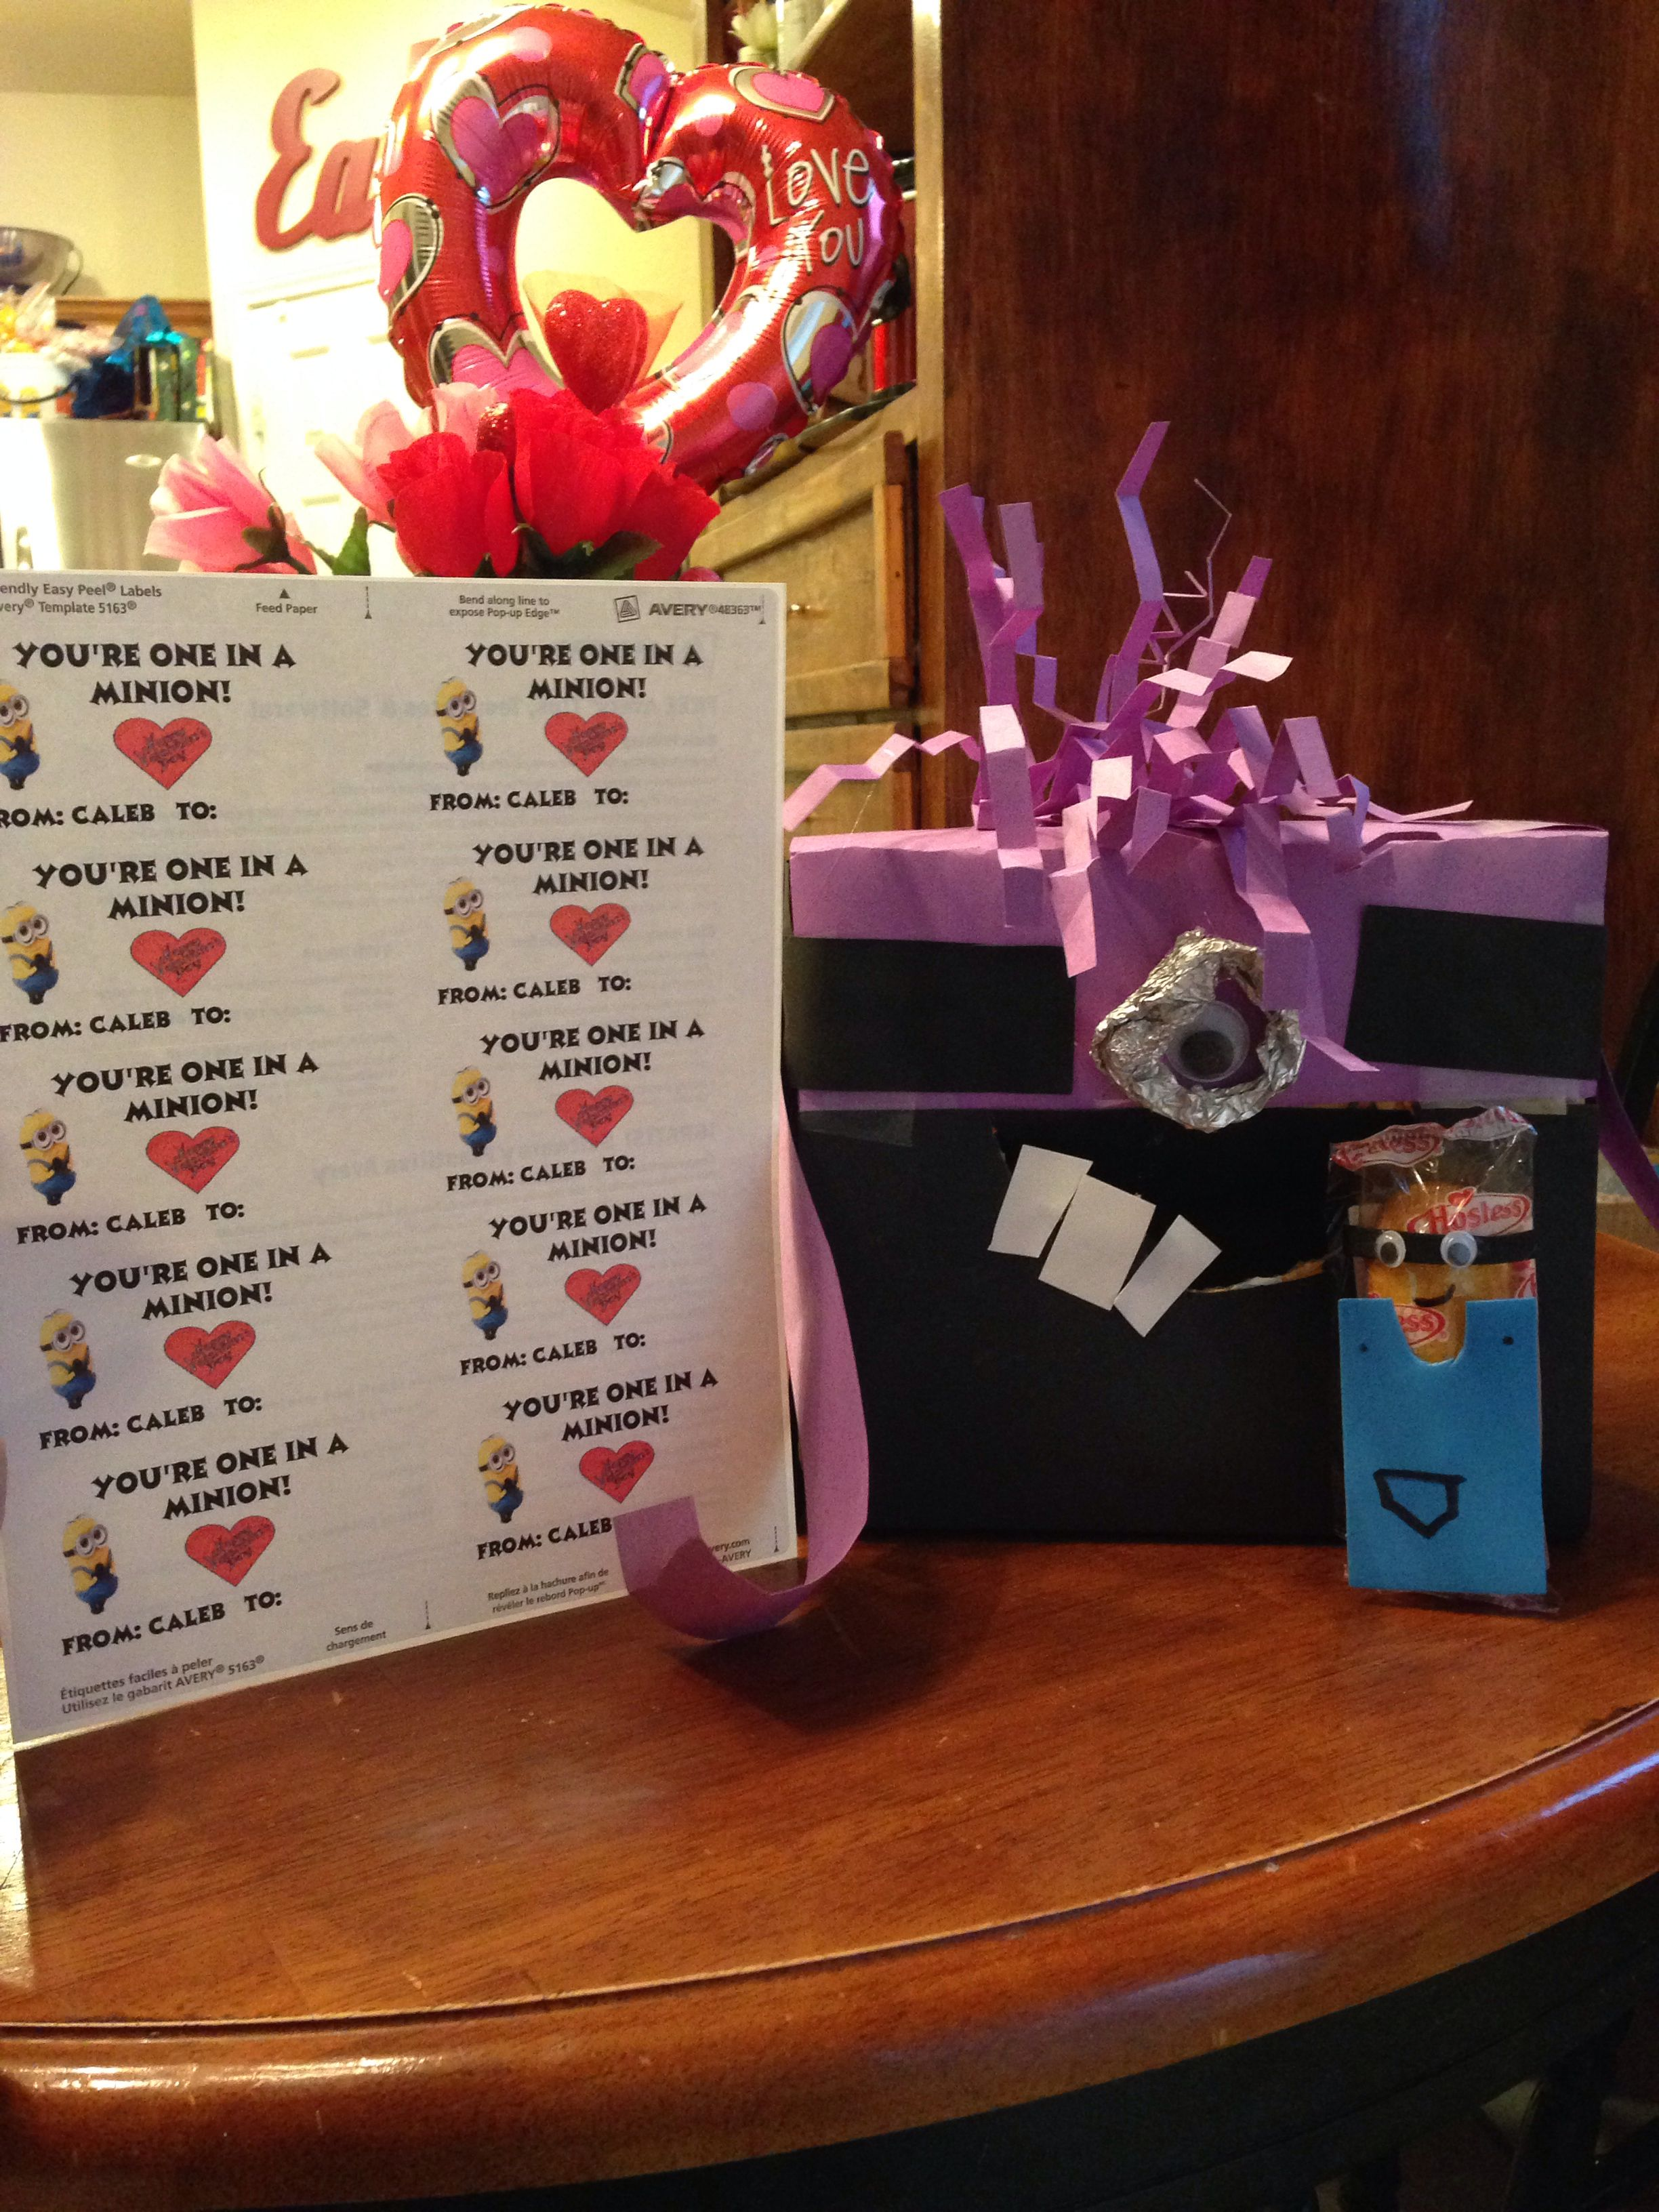 It S A Minion Valentine We Made A Purple Minion Valentine Box For Collecting Simple Construction Paper Lg Goog Minion Valentine Valentine Box Purple Minions